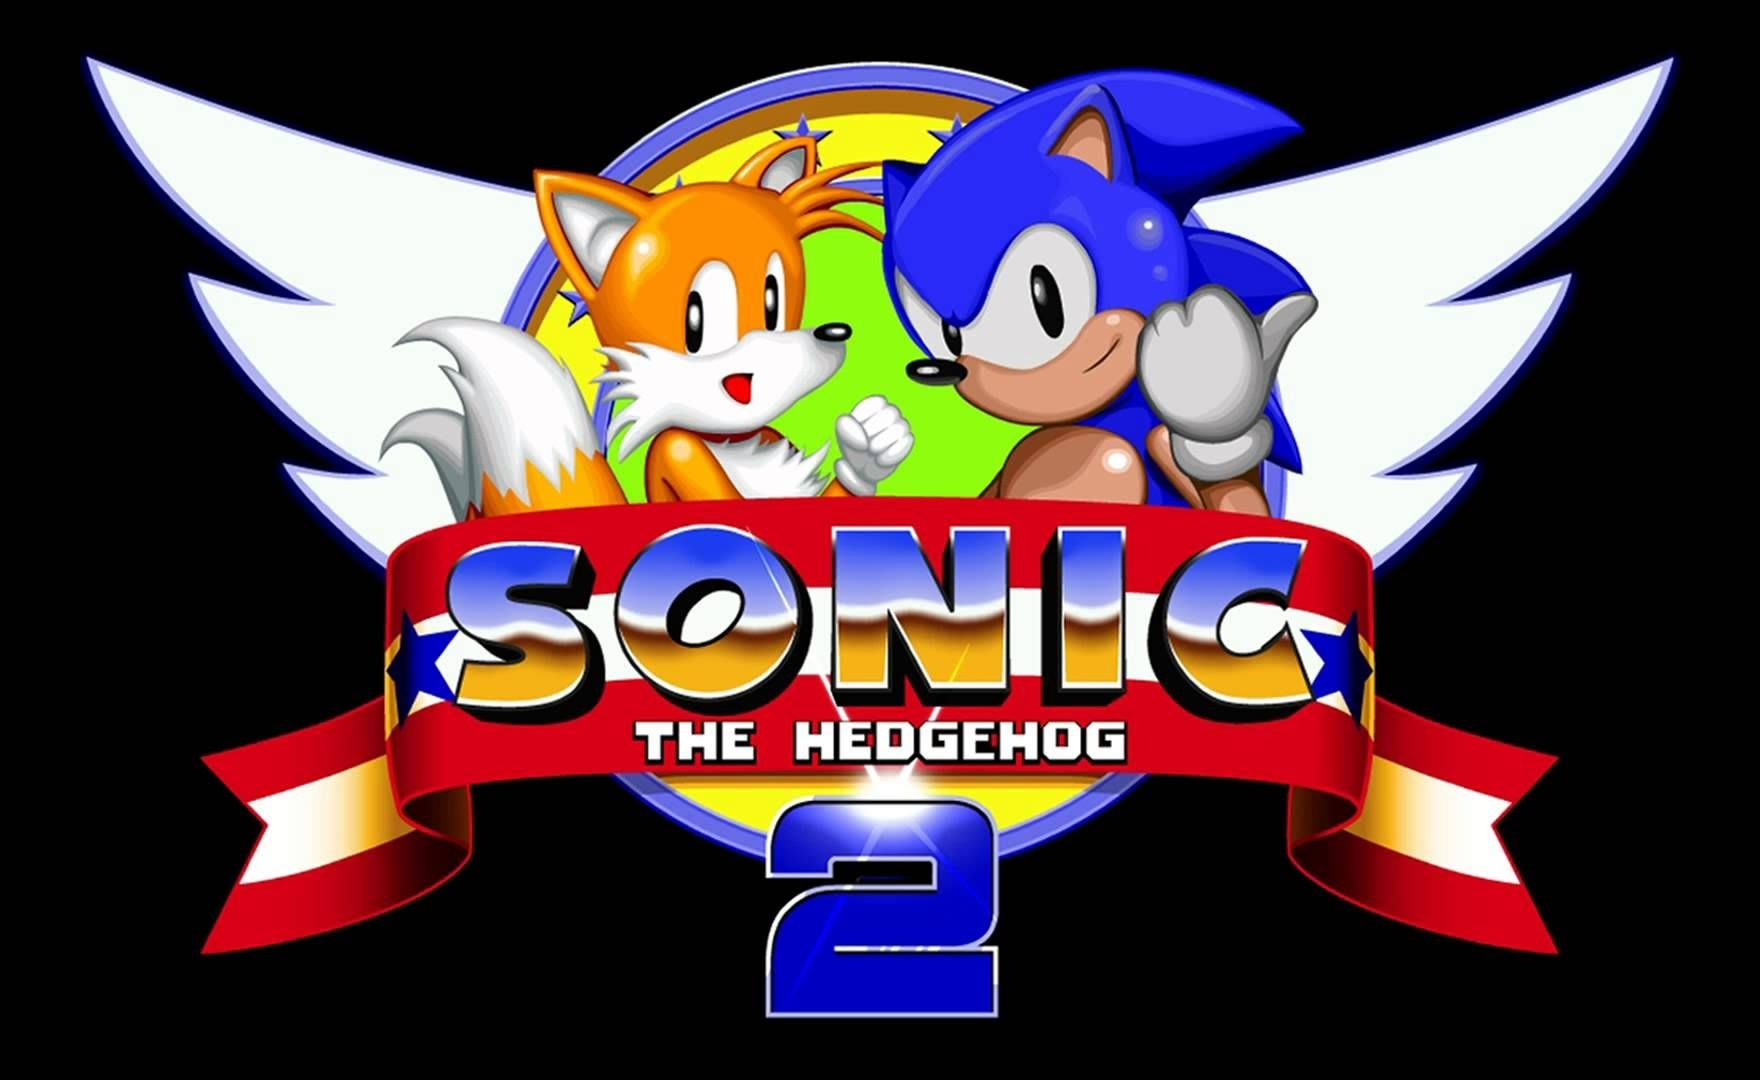 Sonic The Hedgehog 2 Gratis su Steam